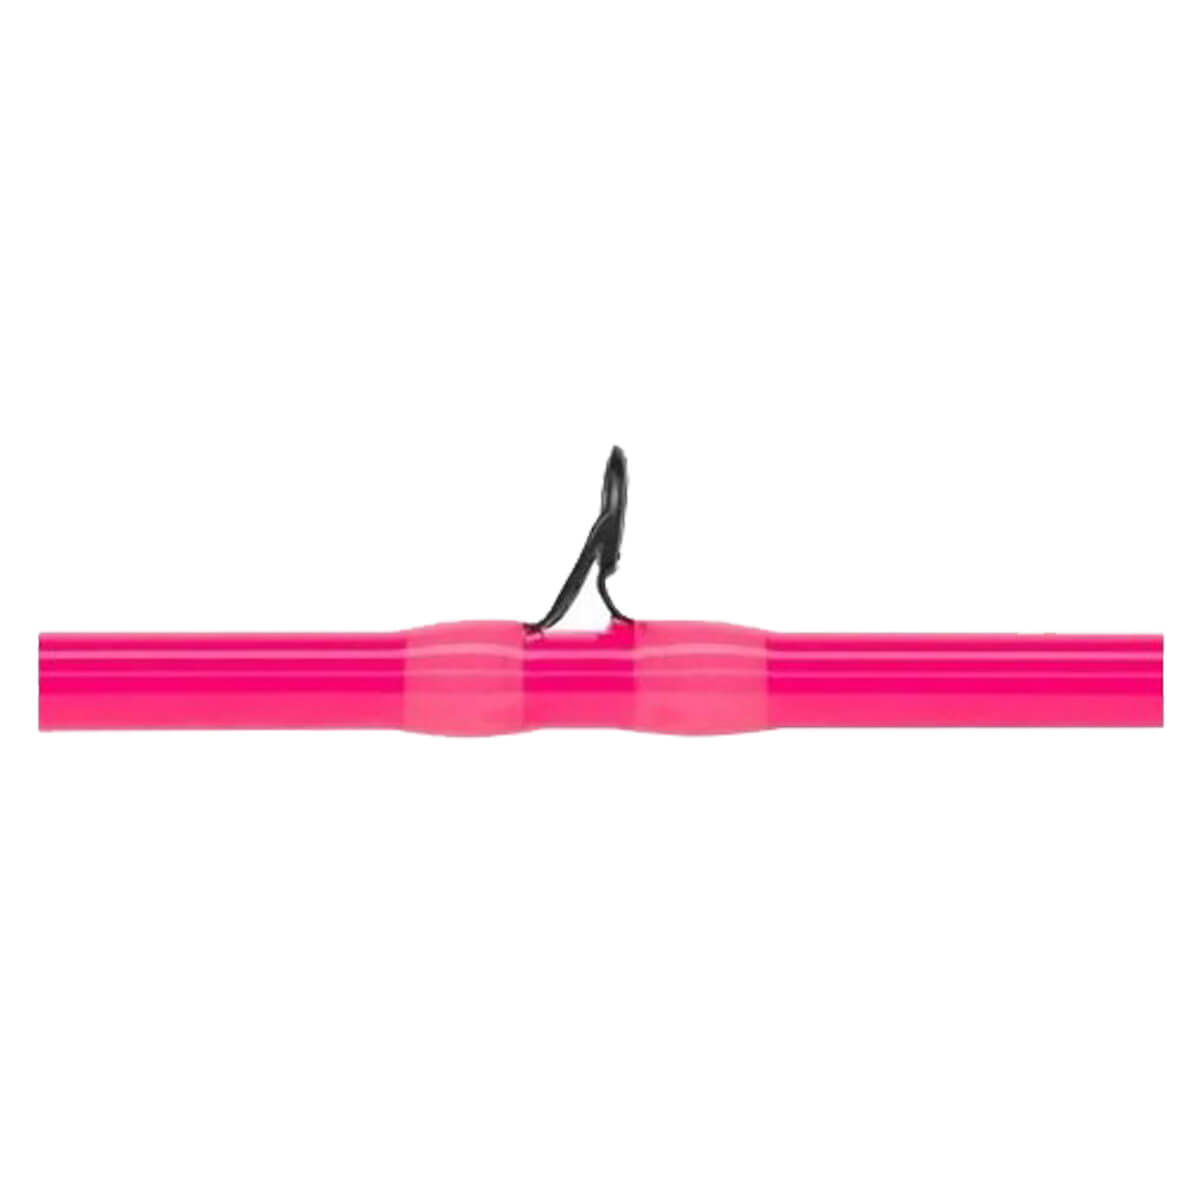 Ponteira Saint Vara Pró Tamba Pink p/ Carretilha 2,40 m 50 Lbs  - Pró Pesca Shop